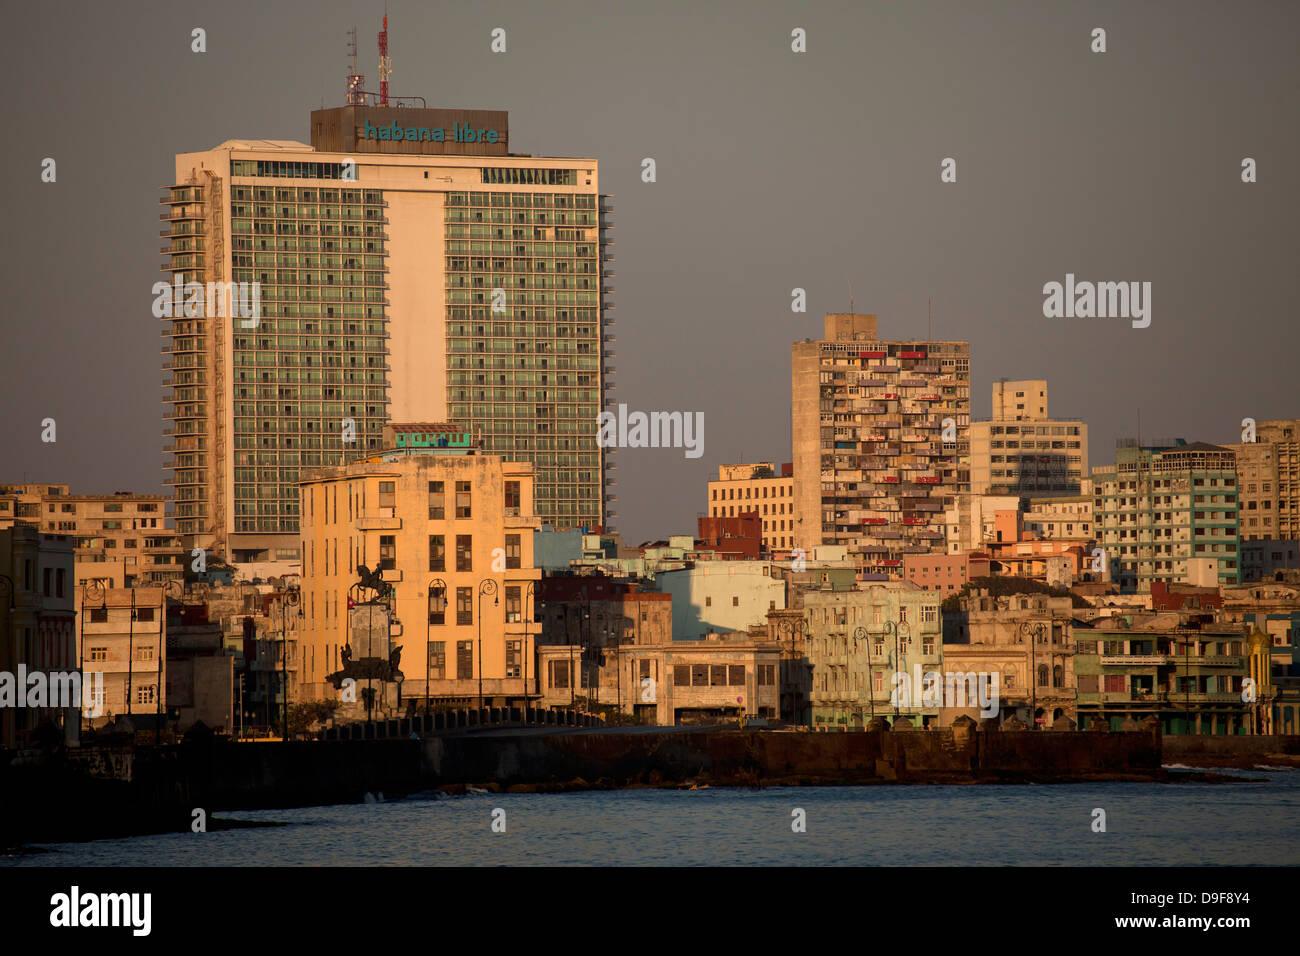 Paysage urbain avec l'hôtel Habana Libre, La Havane, Cuba, Caraïbes Photo Stock